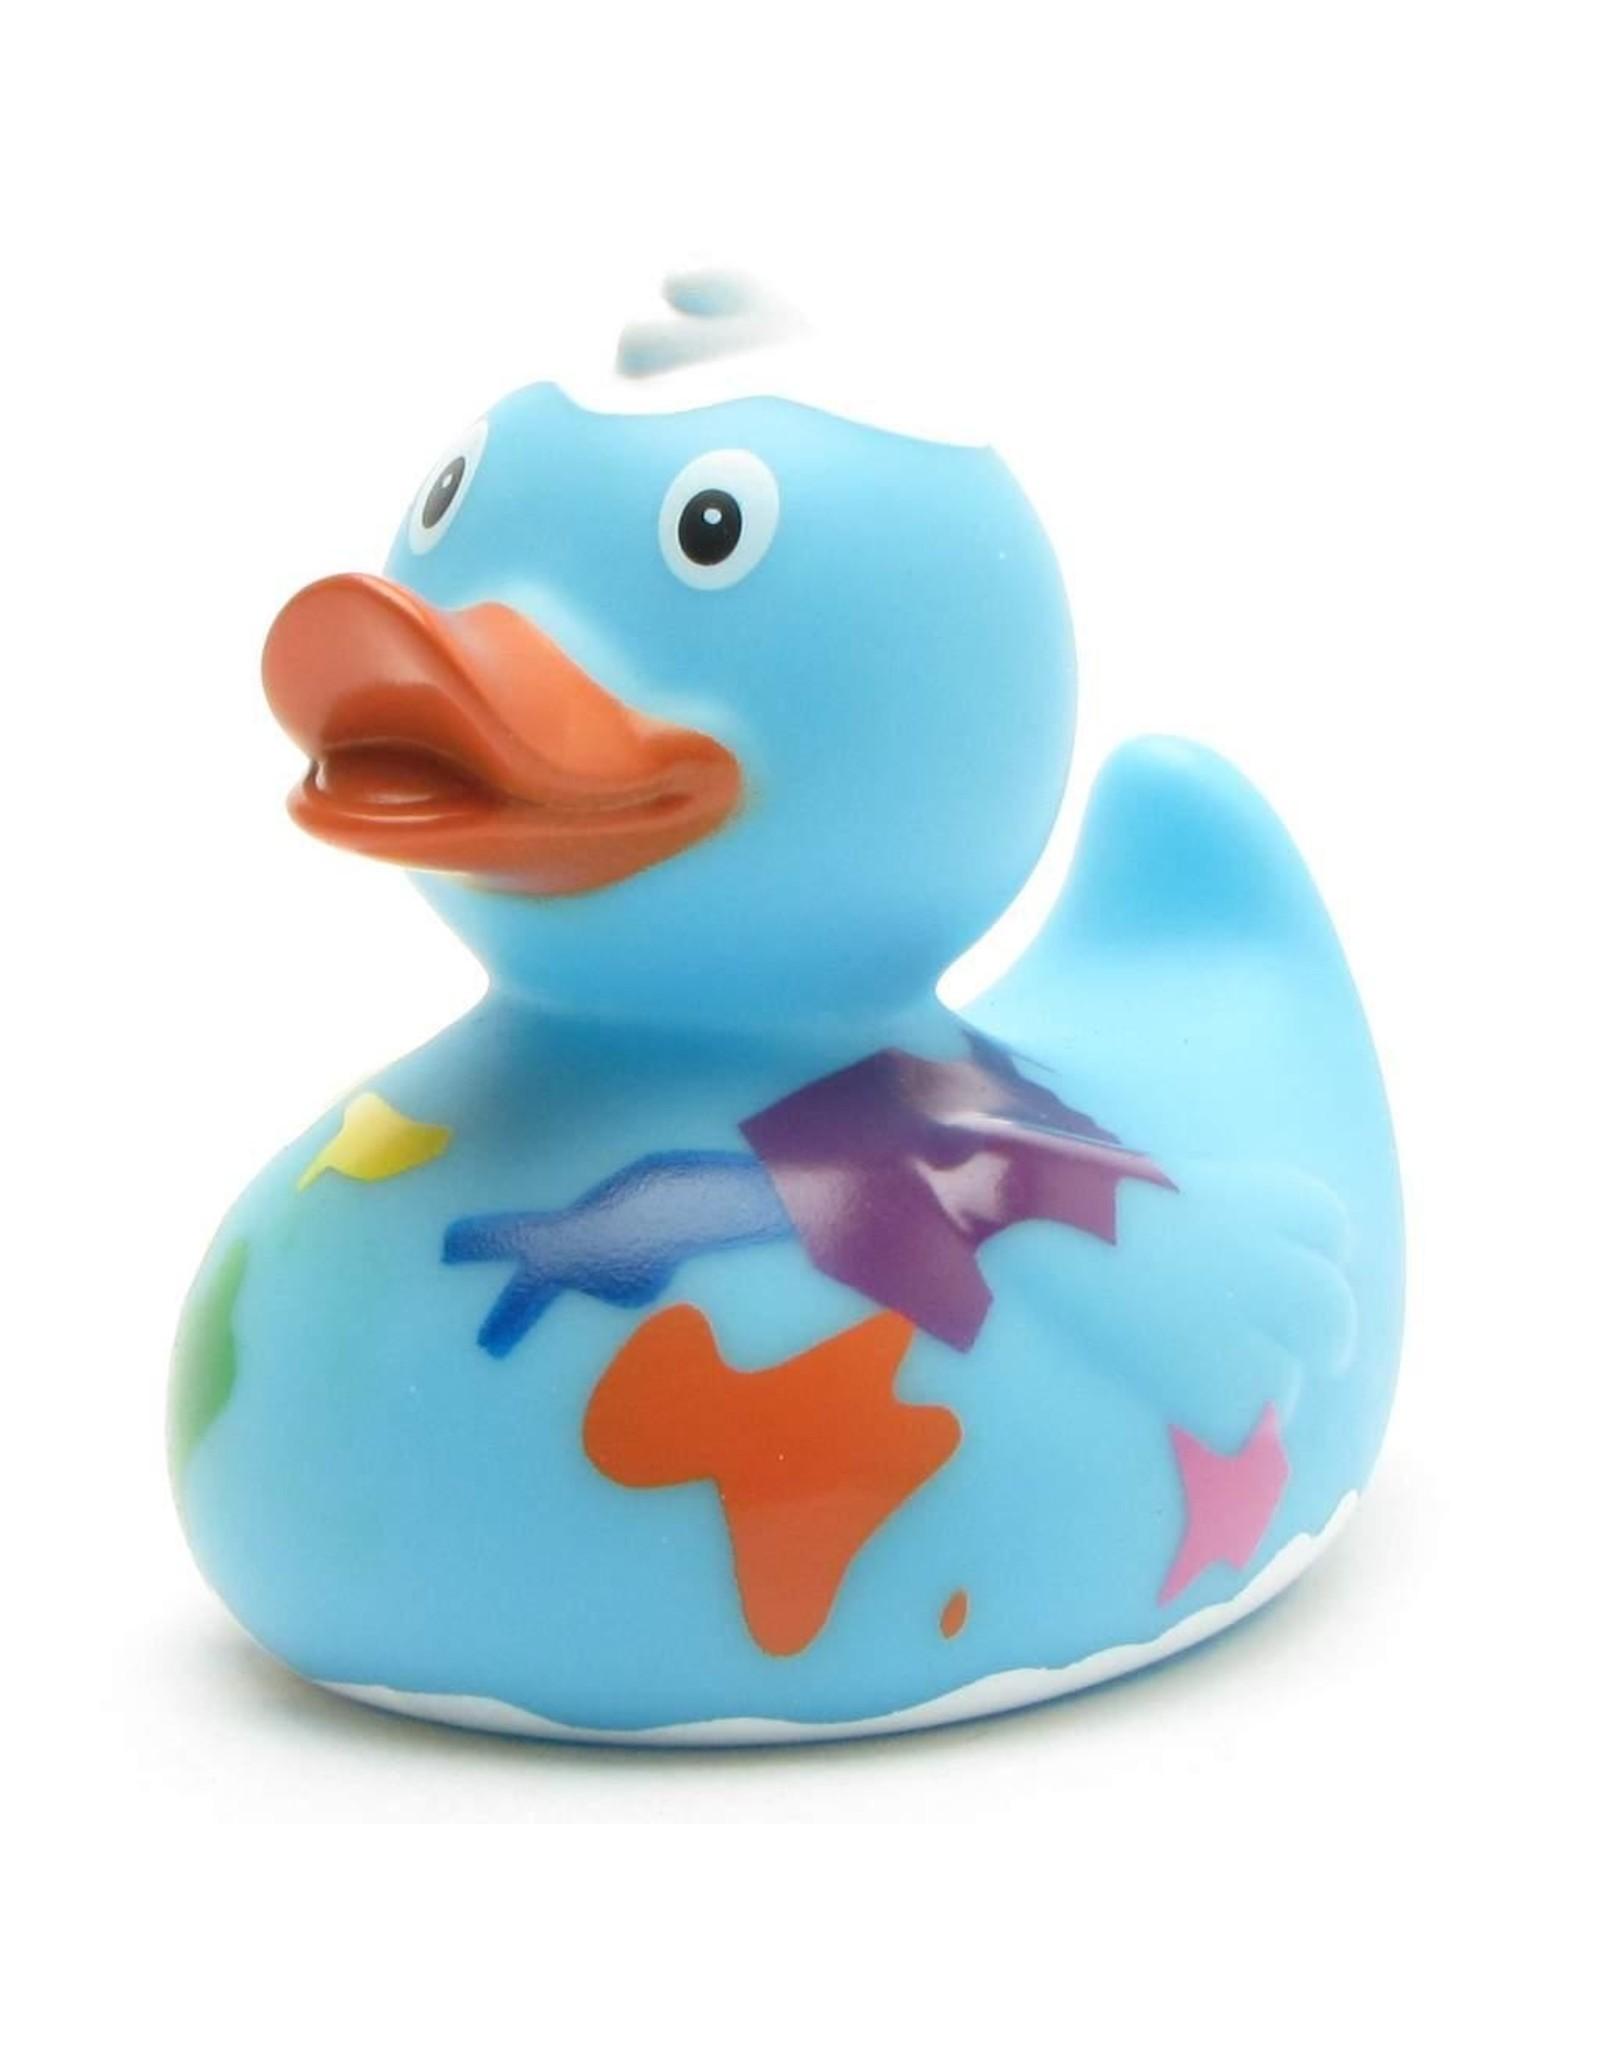 Le canard mondiale